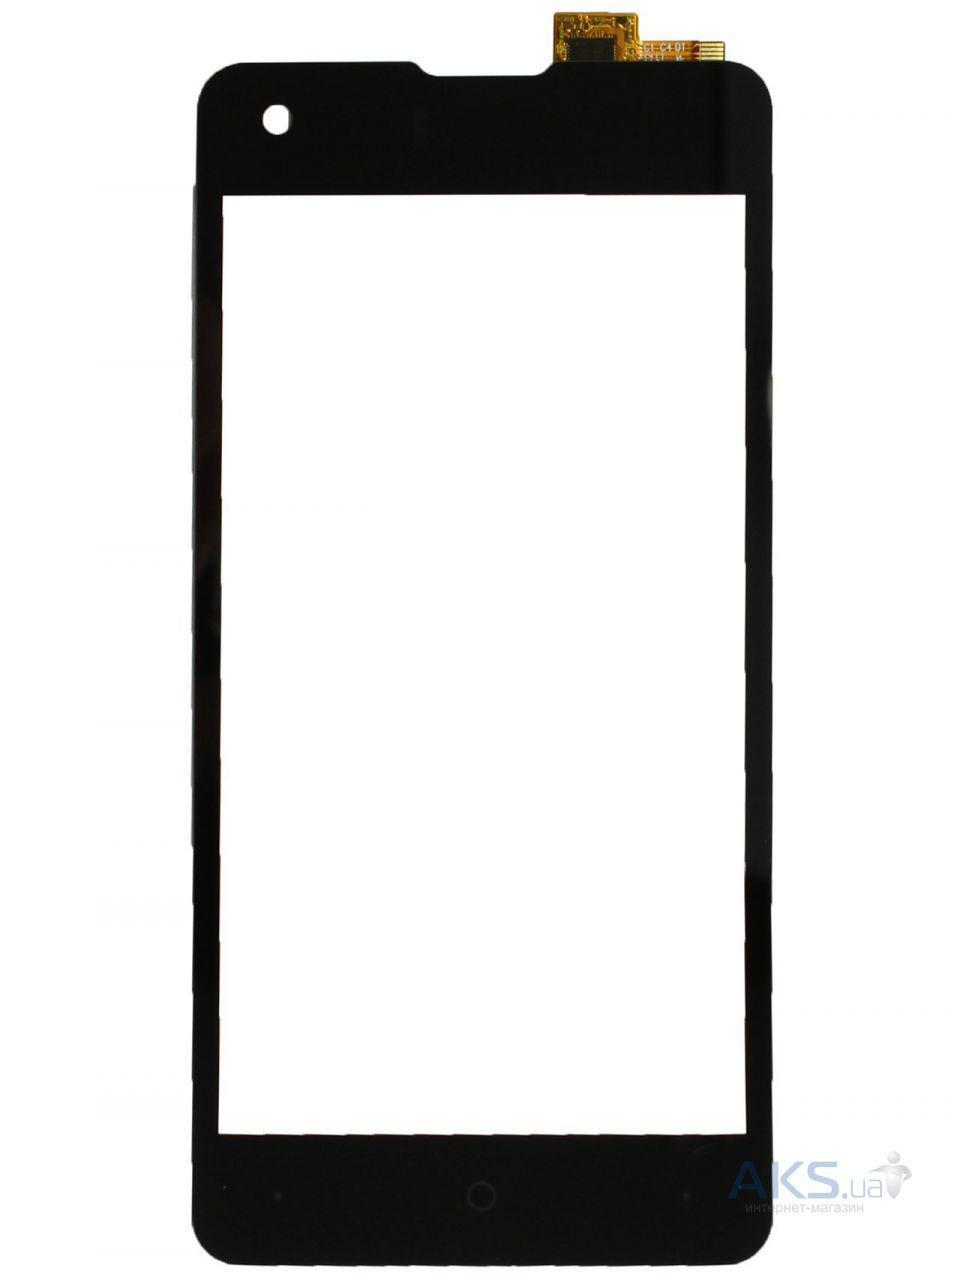 Сенсорный экран (тачскрин) Impression ImSmart S471 Black